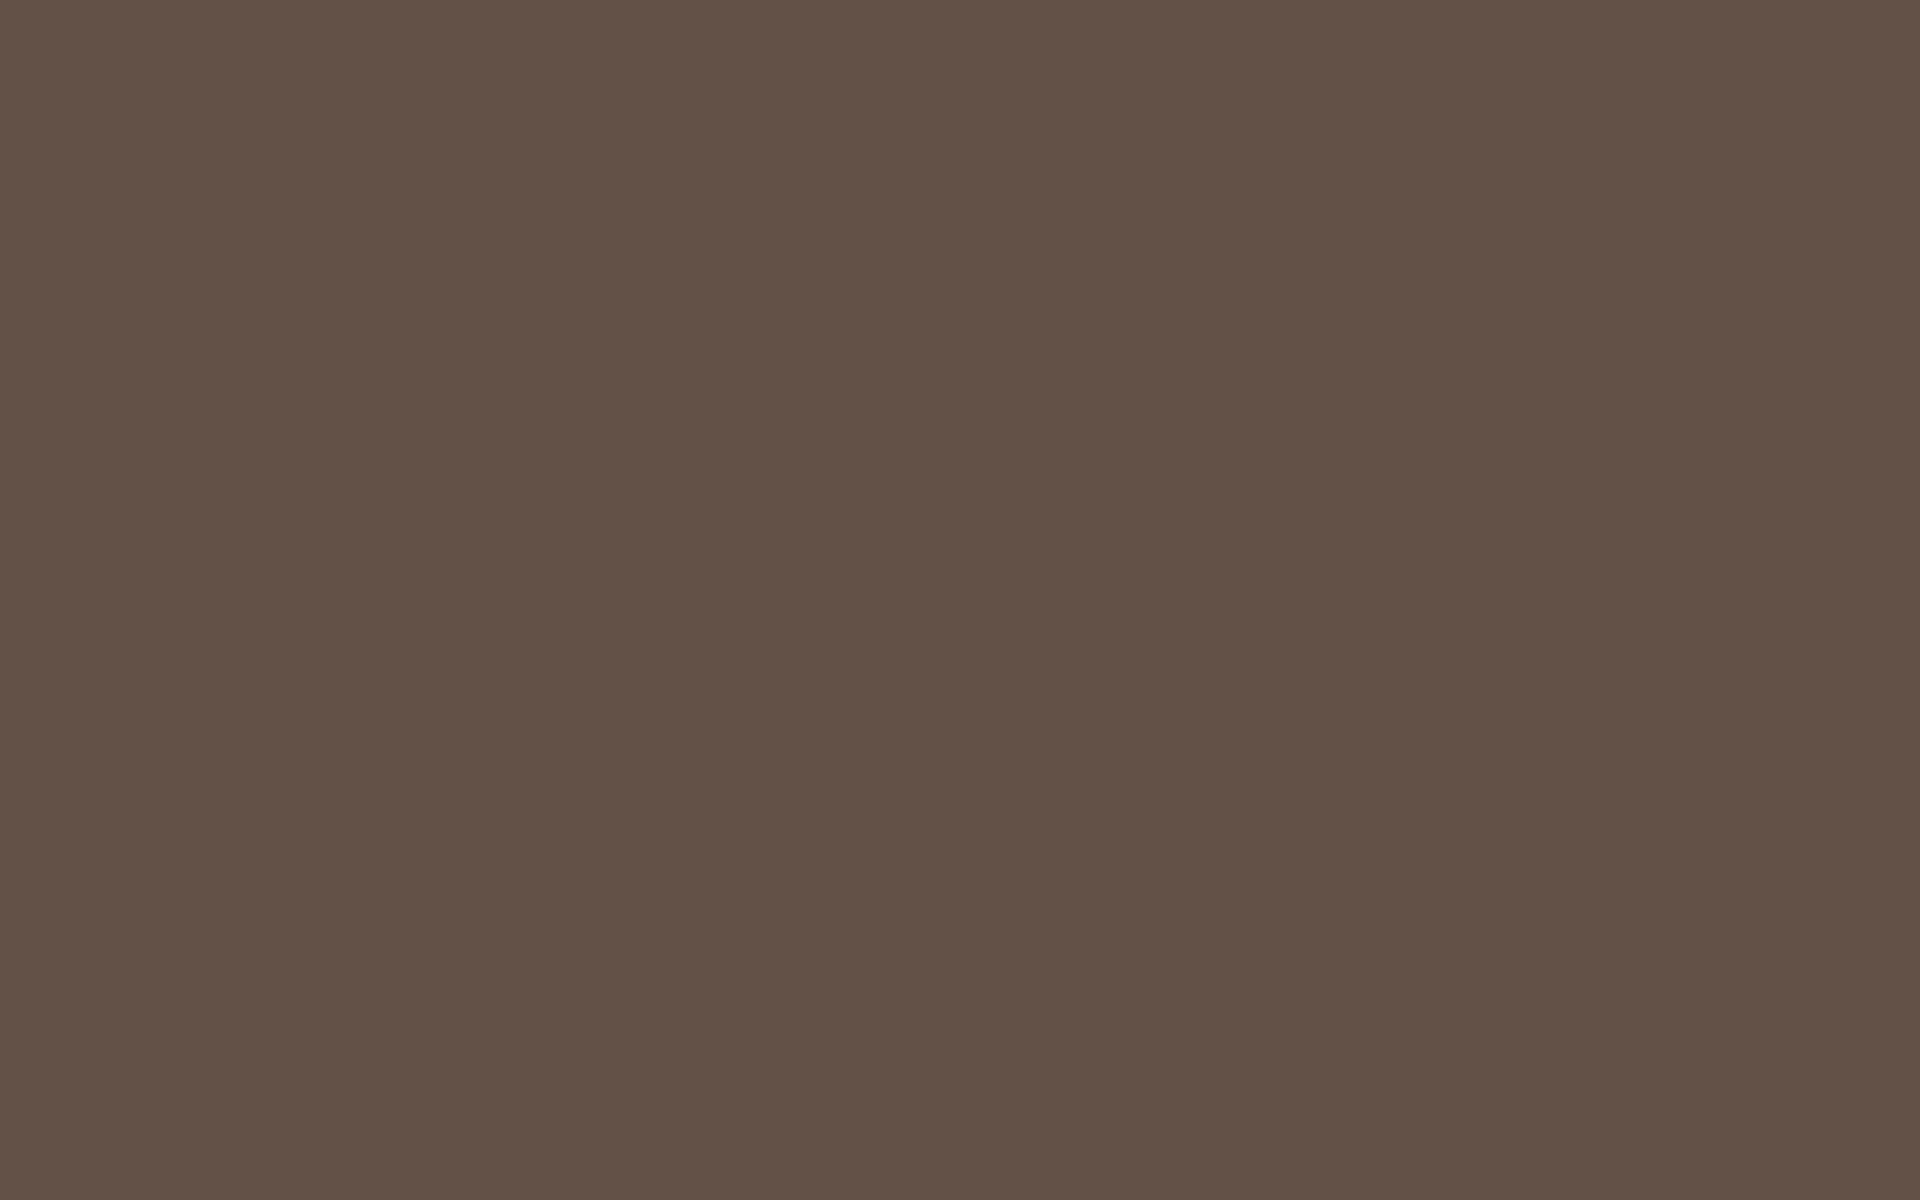 1920x1200 Umber Solid Color Background